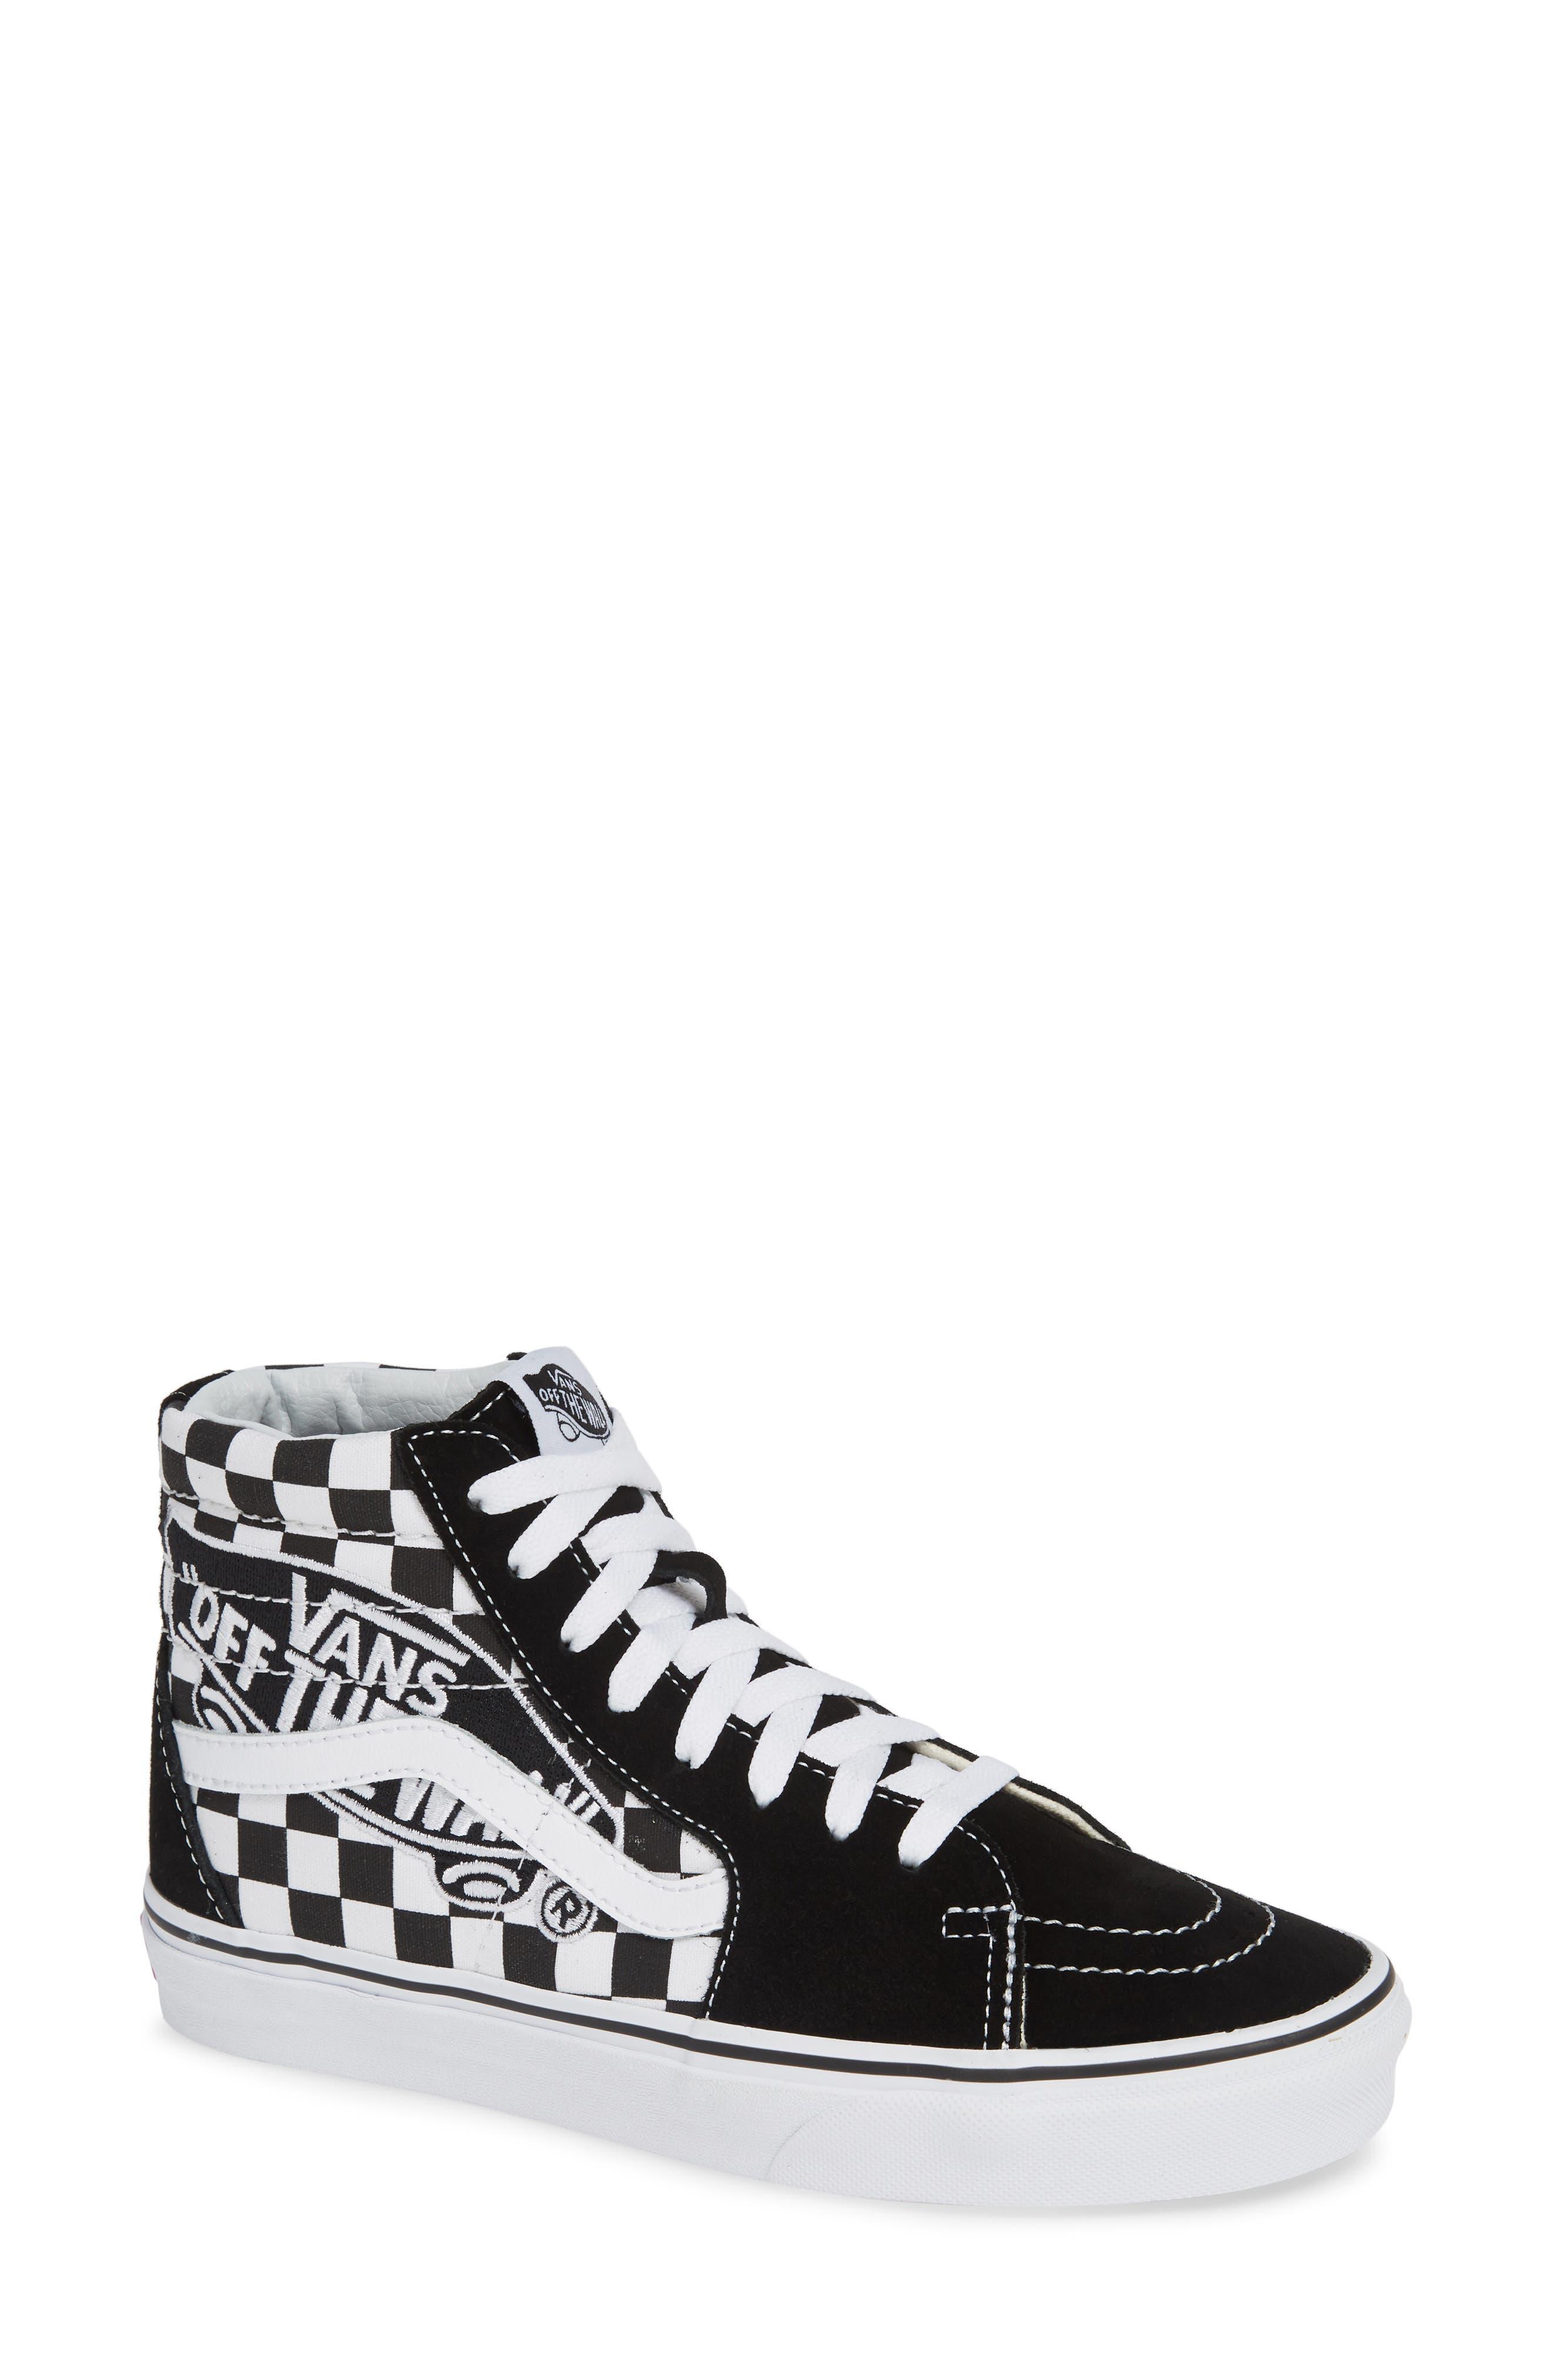 Sk8-Hi Patch High Top Sneaker, Main, color, BLACK/ TRUE WHITE